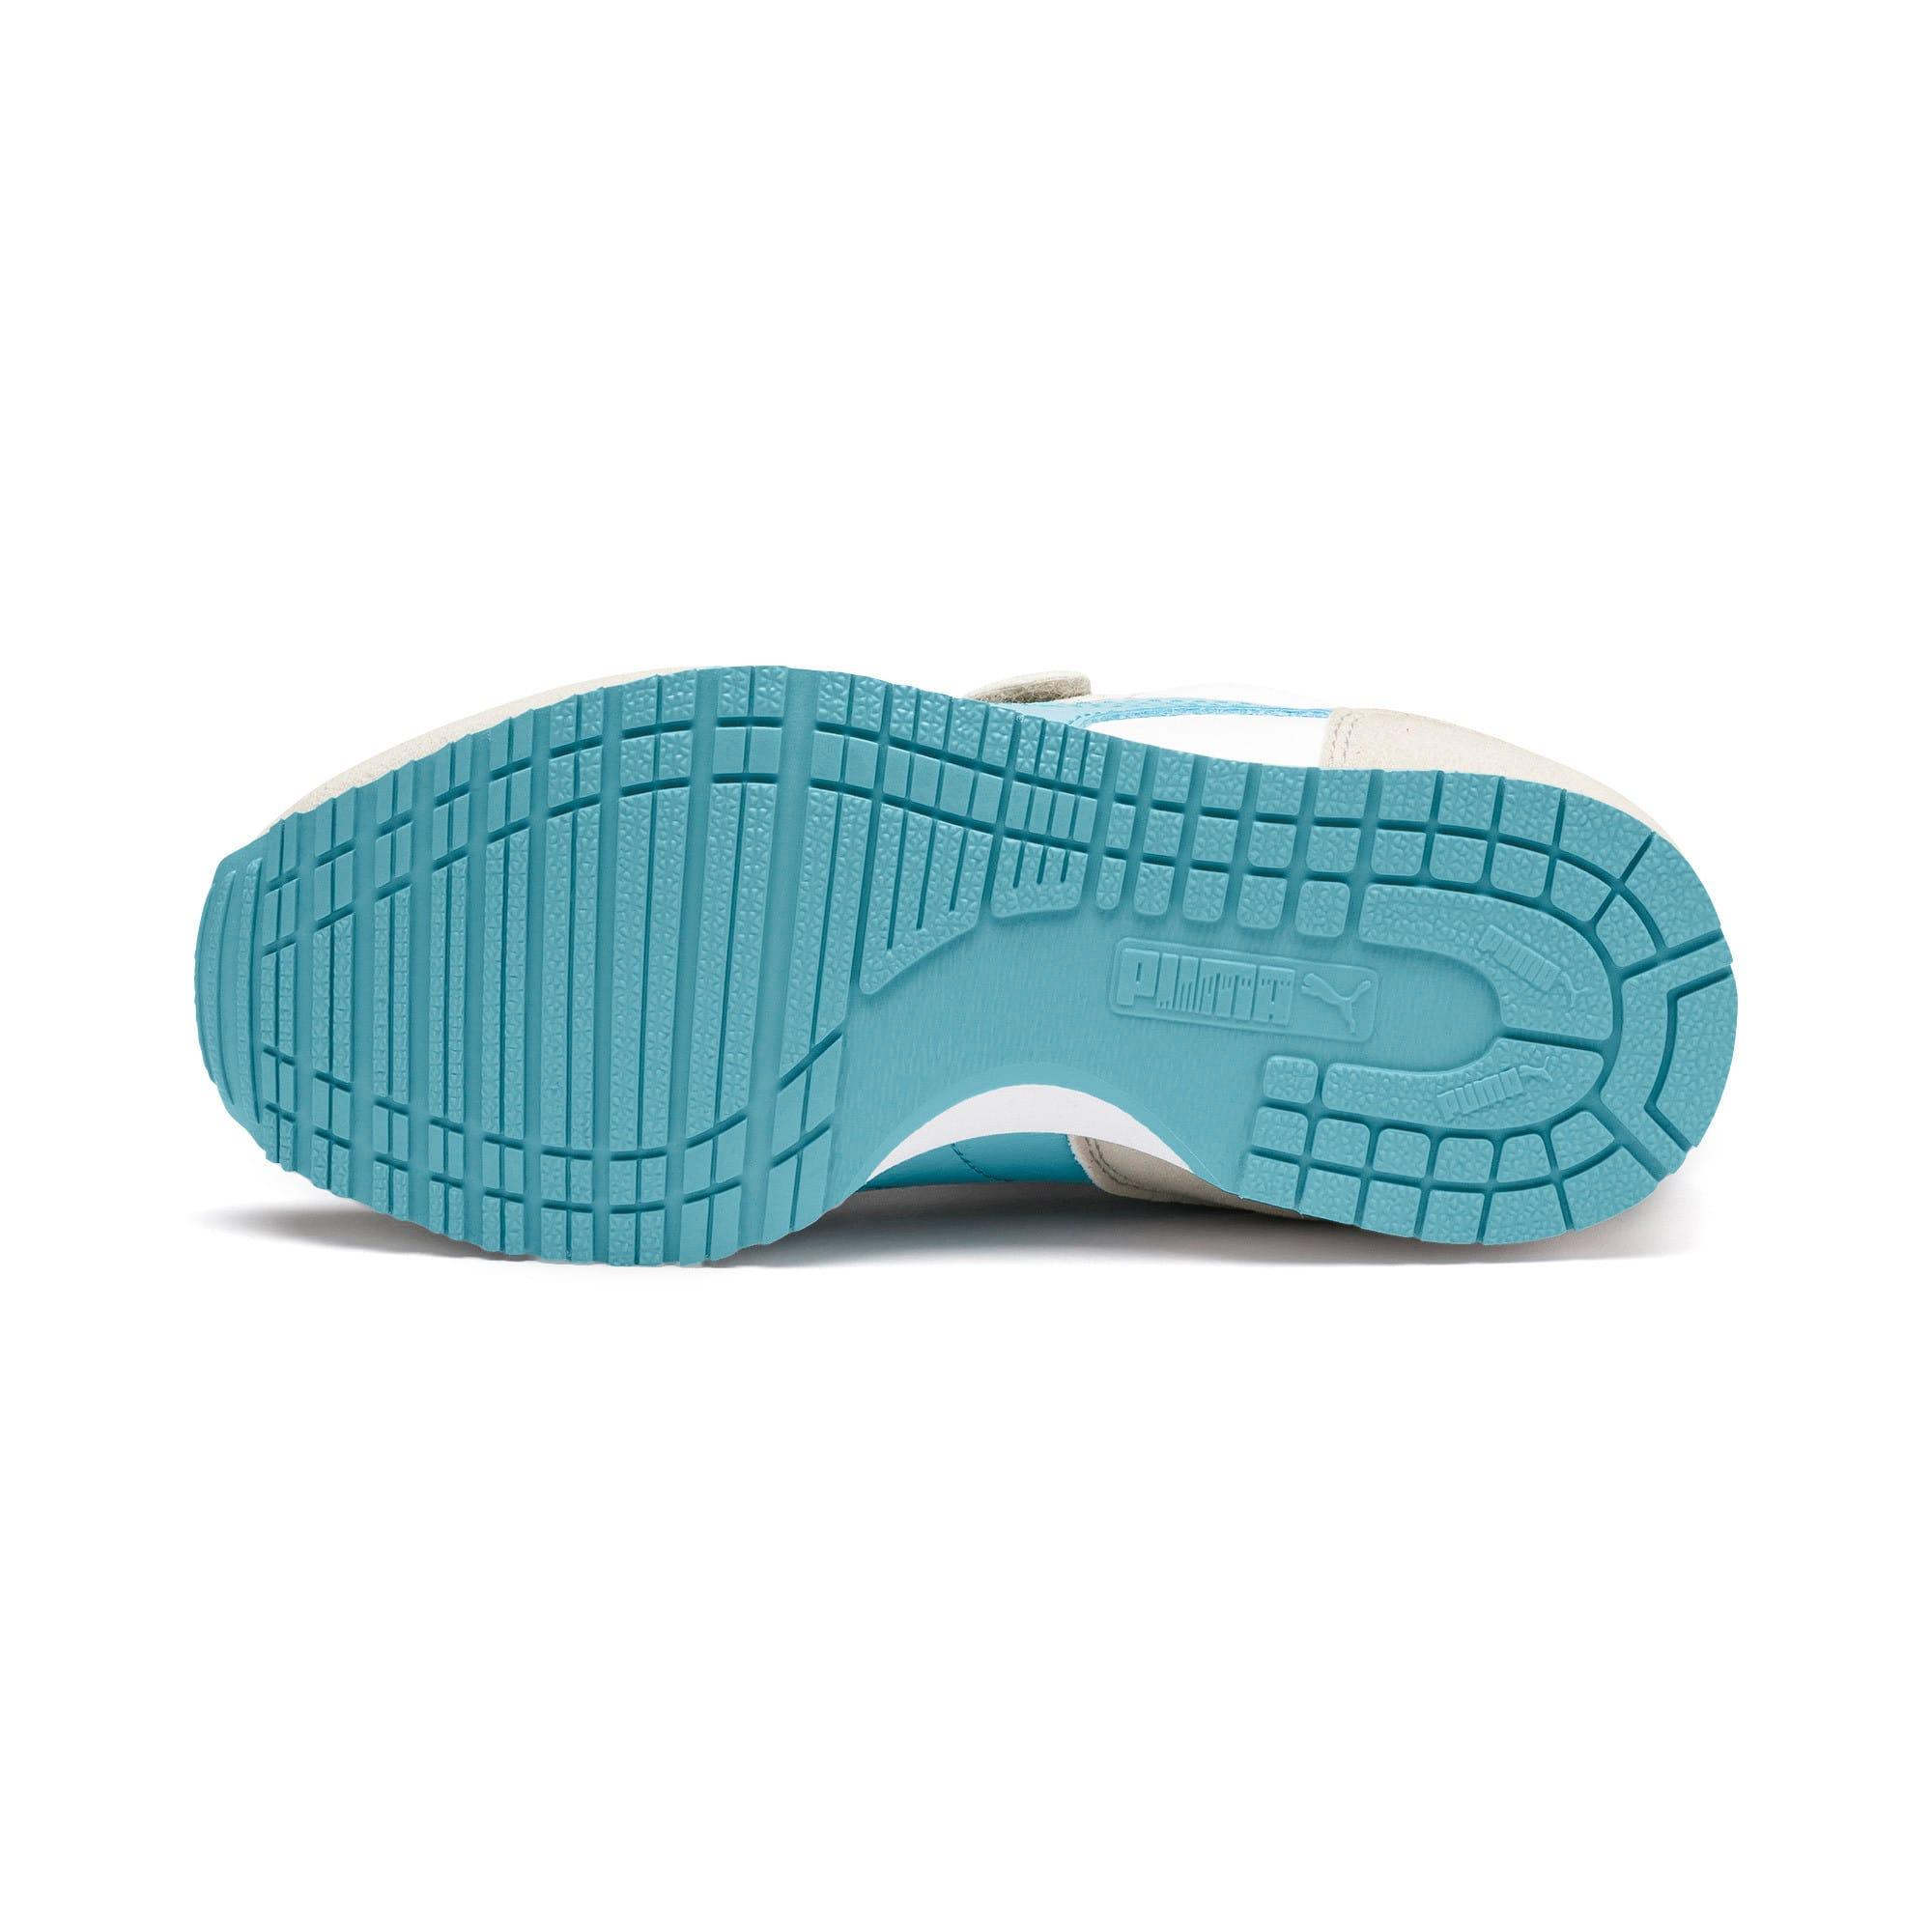 Thumbnail 4 of Cabana Racer SL AC Little Kids' Shoes, Puma White-Milky Blue, medium